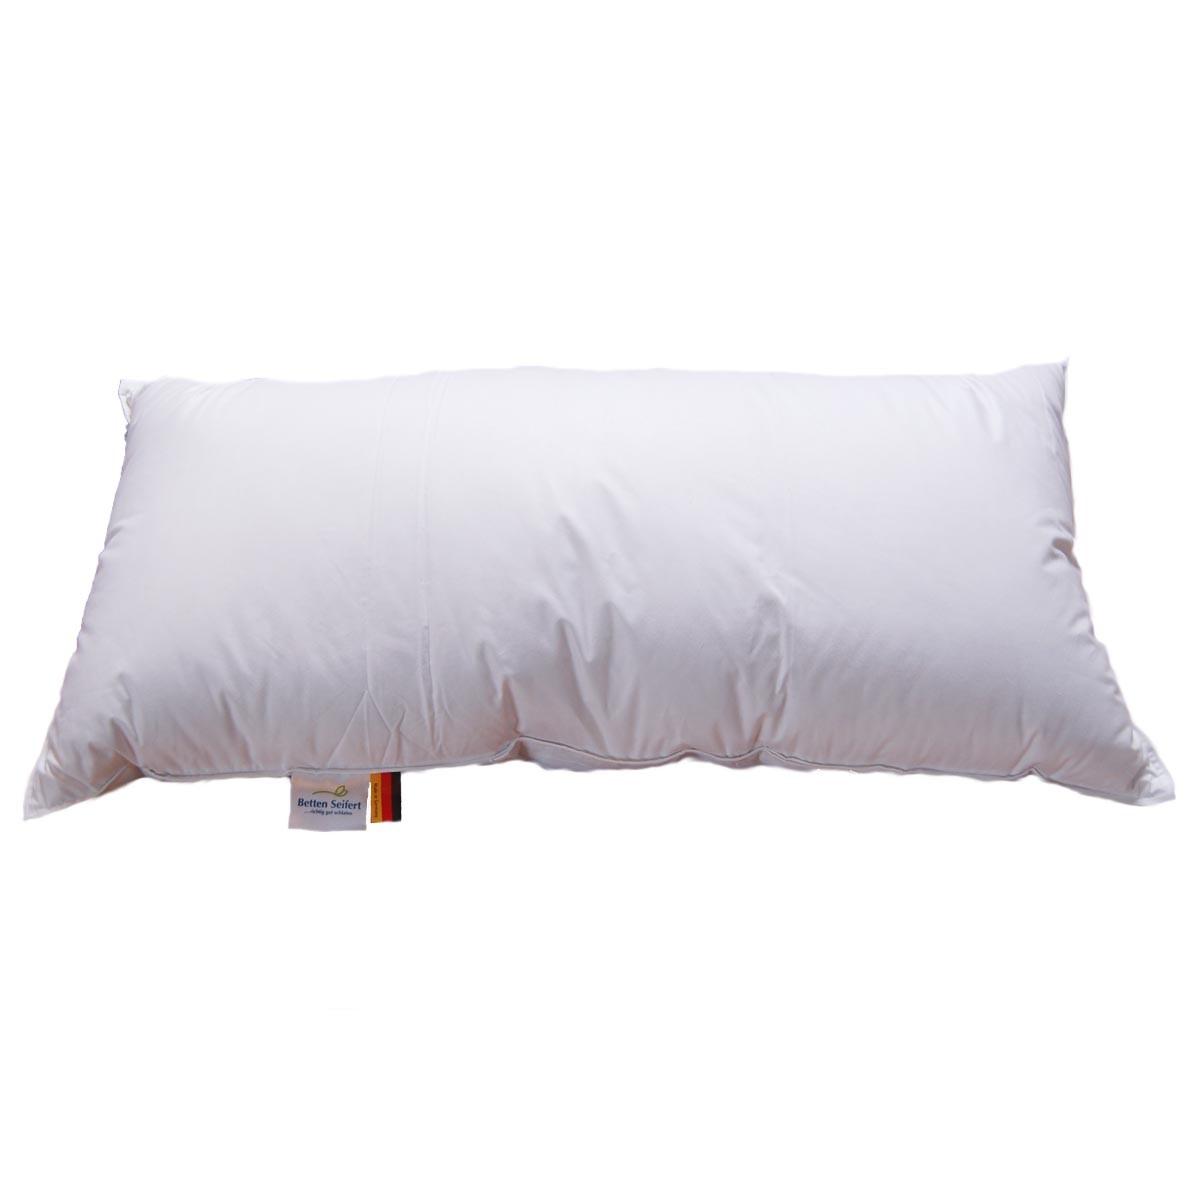 betten seifert wechselschl ferkissen 40 x 80 cm kissen nackenkissen. Black Bedroom Furniture Sets. Home Design Ideas